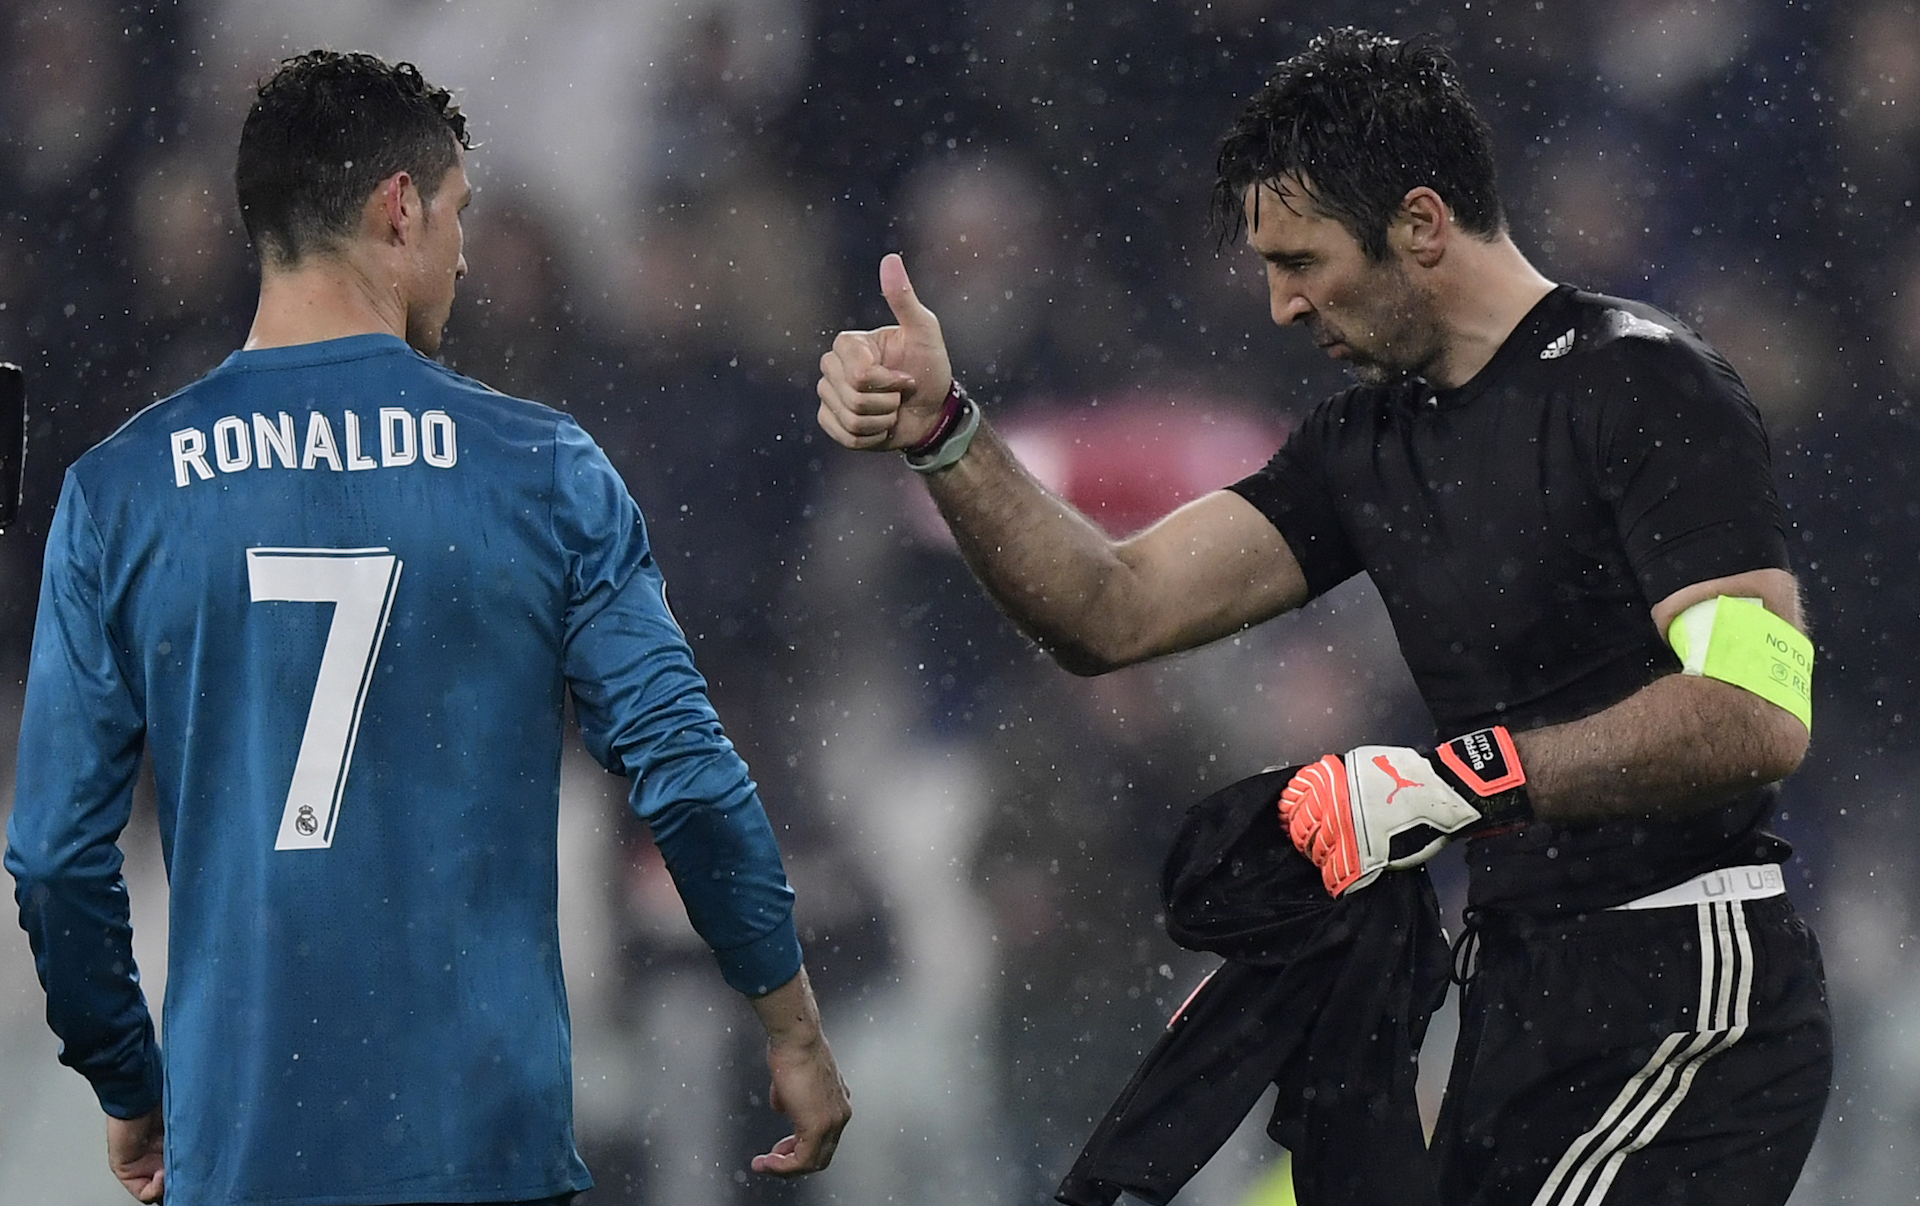 Cristiano Ronaldo & Gianluigi Buffon